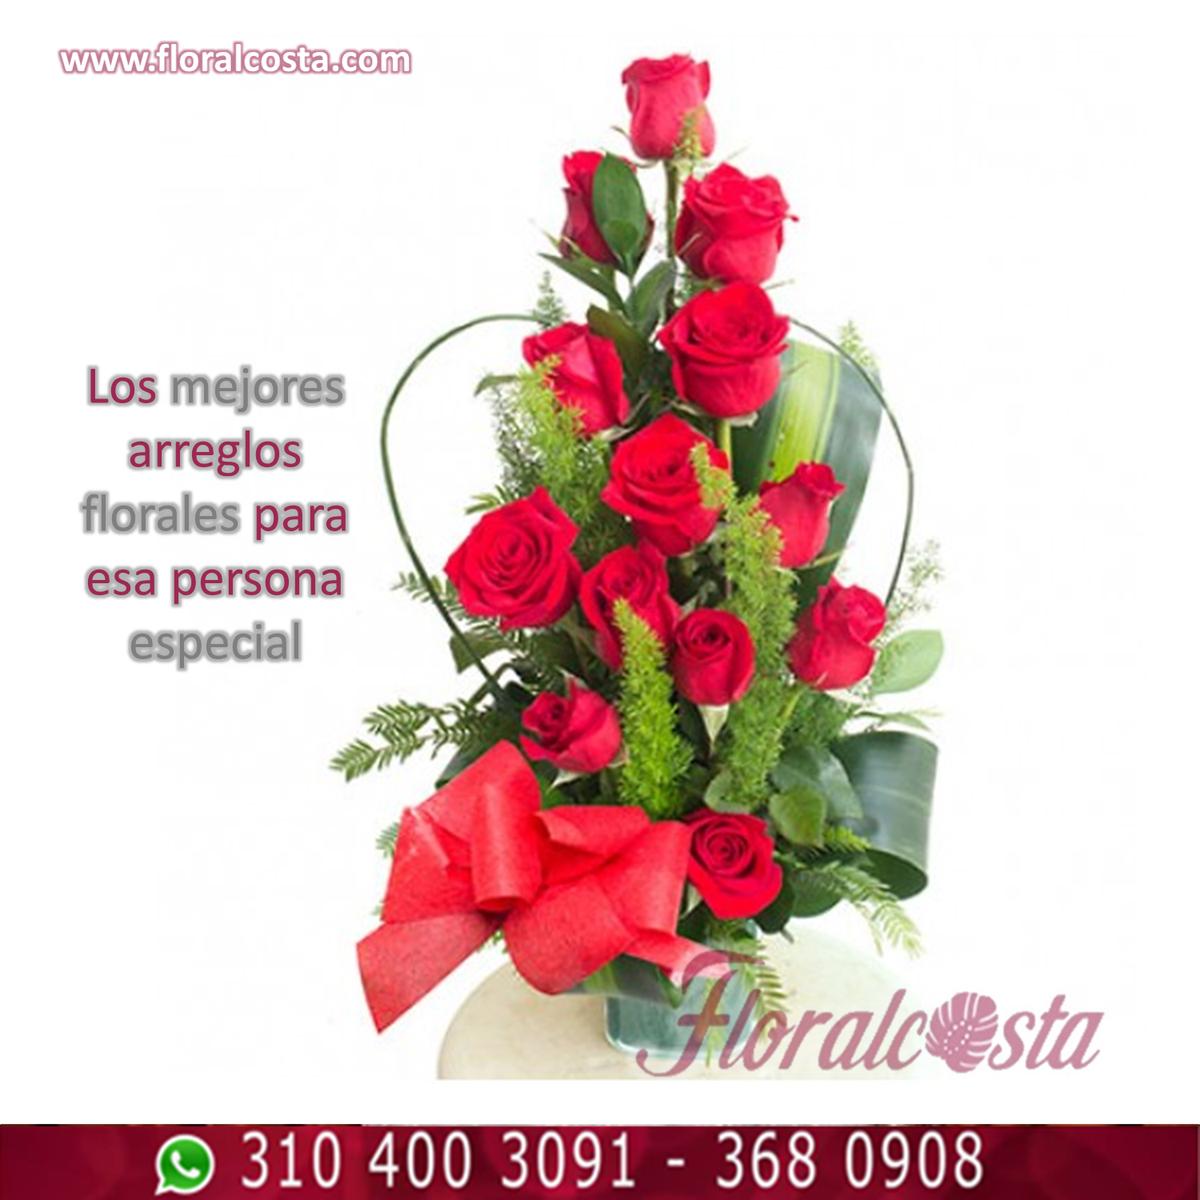 Floralcosta On Twitter Regala Momentos Inolvidables